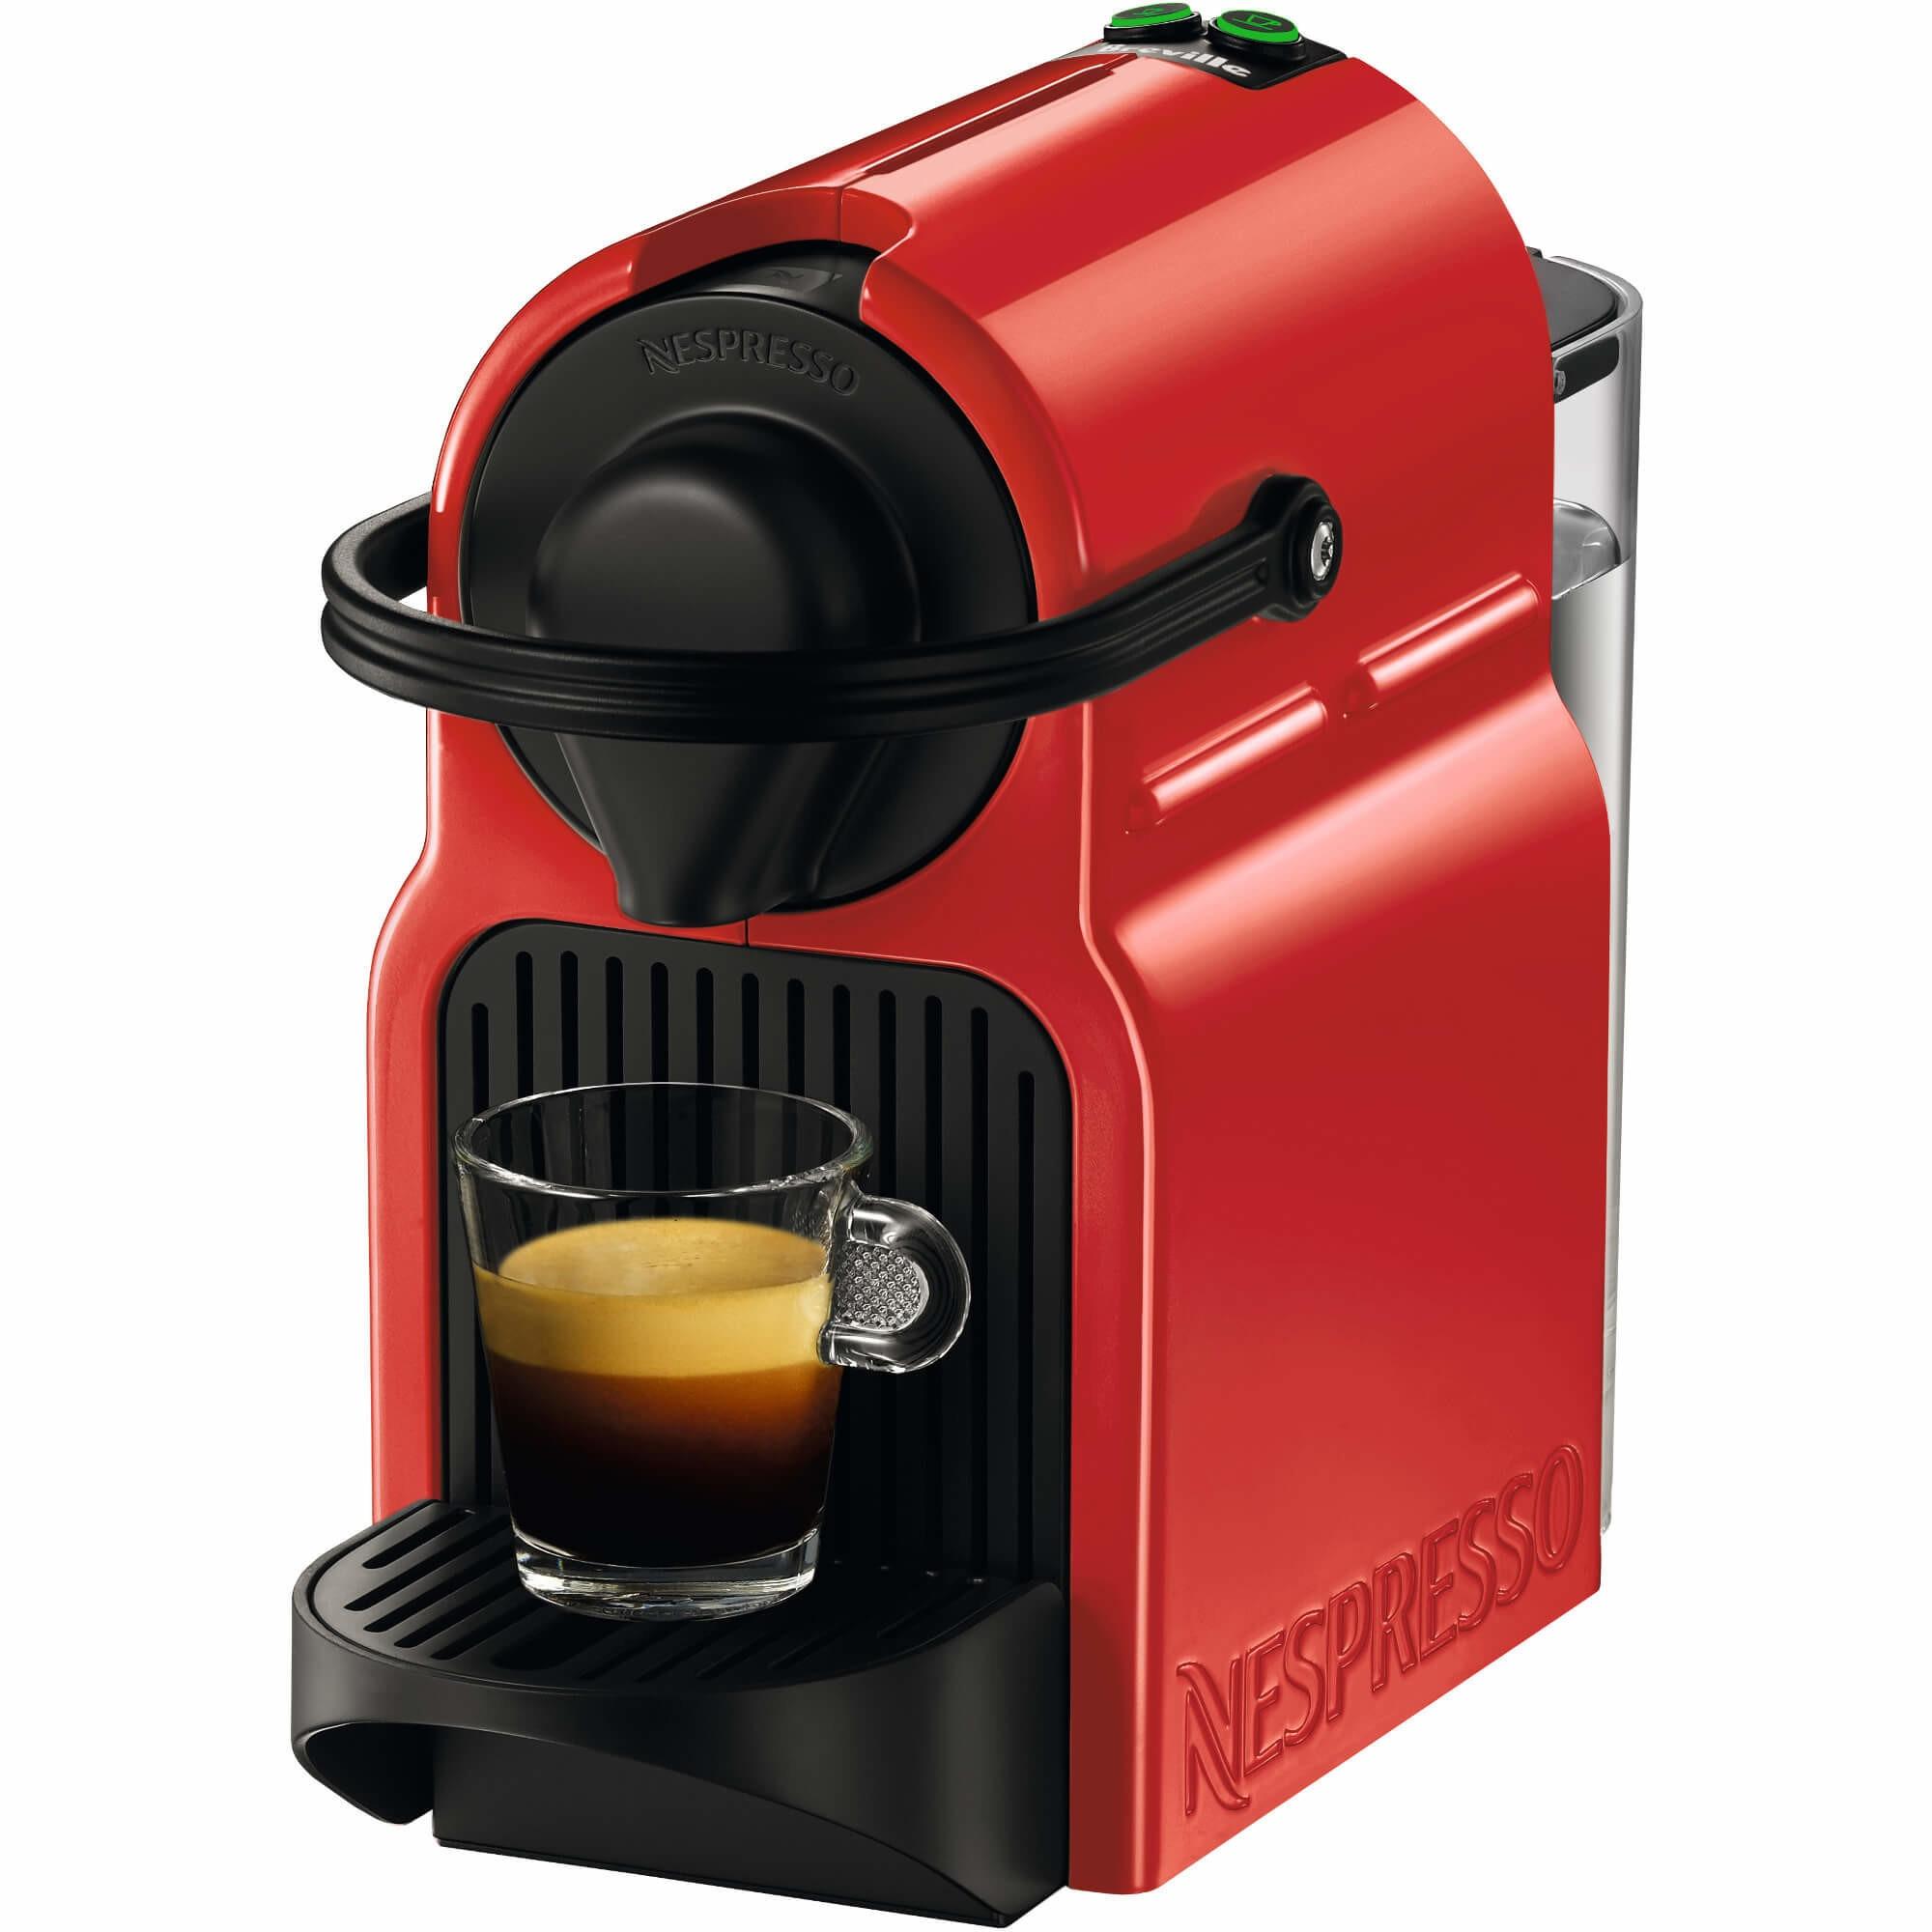 Fotografie Espressor Nespresso Inissia Red C40-EU-RE-NE3, 19 bari, 1260 W, 0.7 l, Rosu + 14 capsule cadou